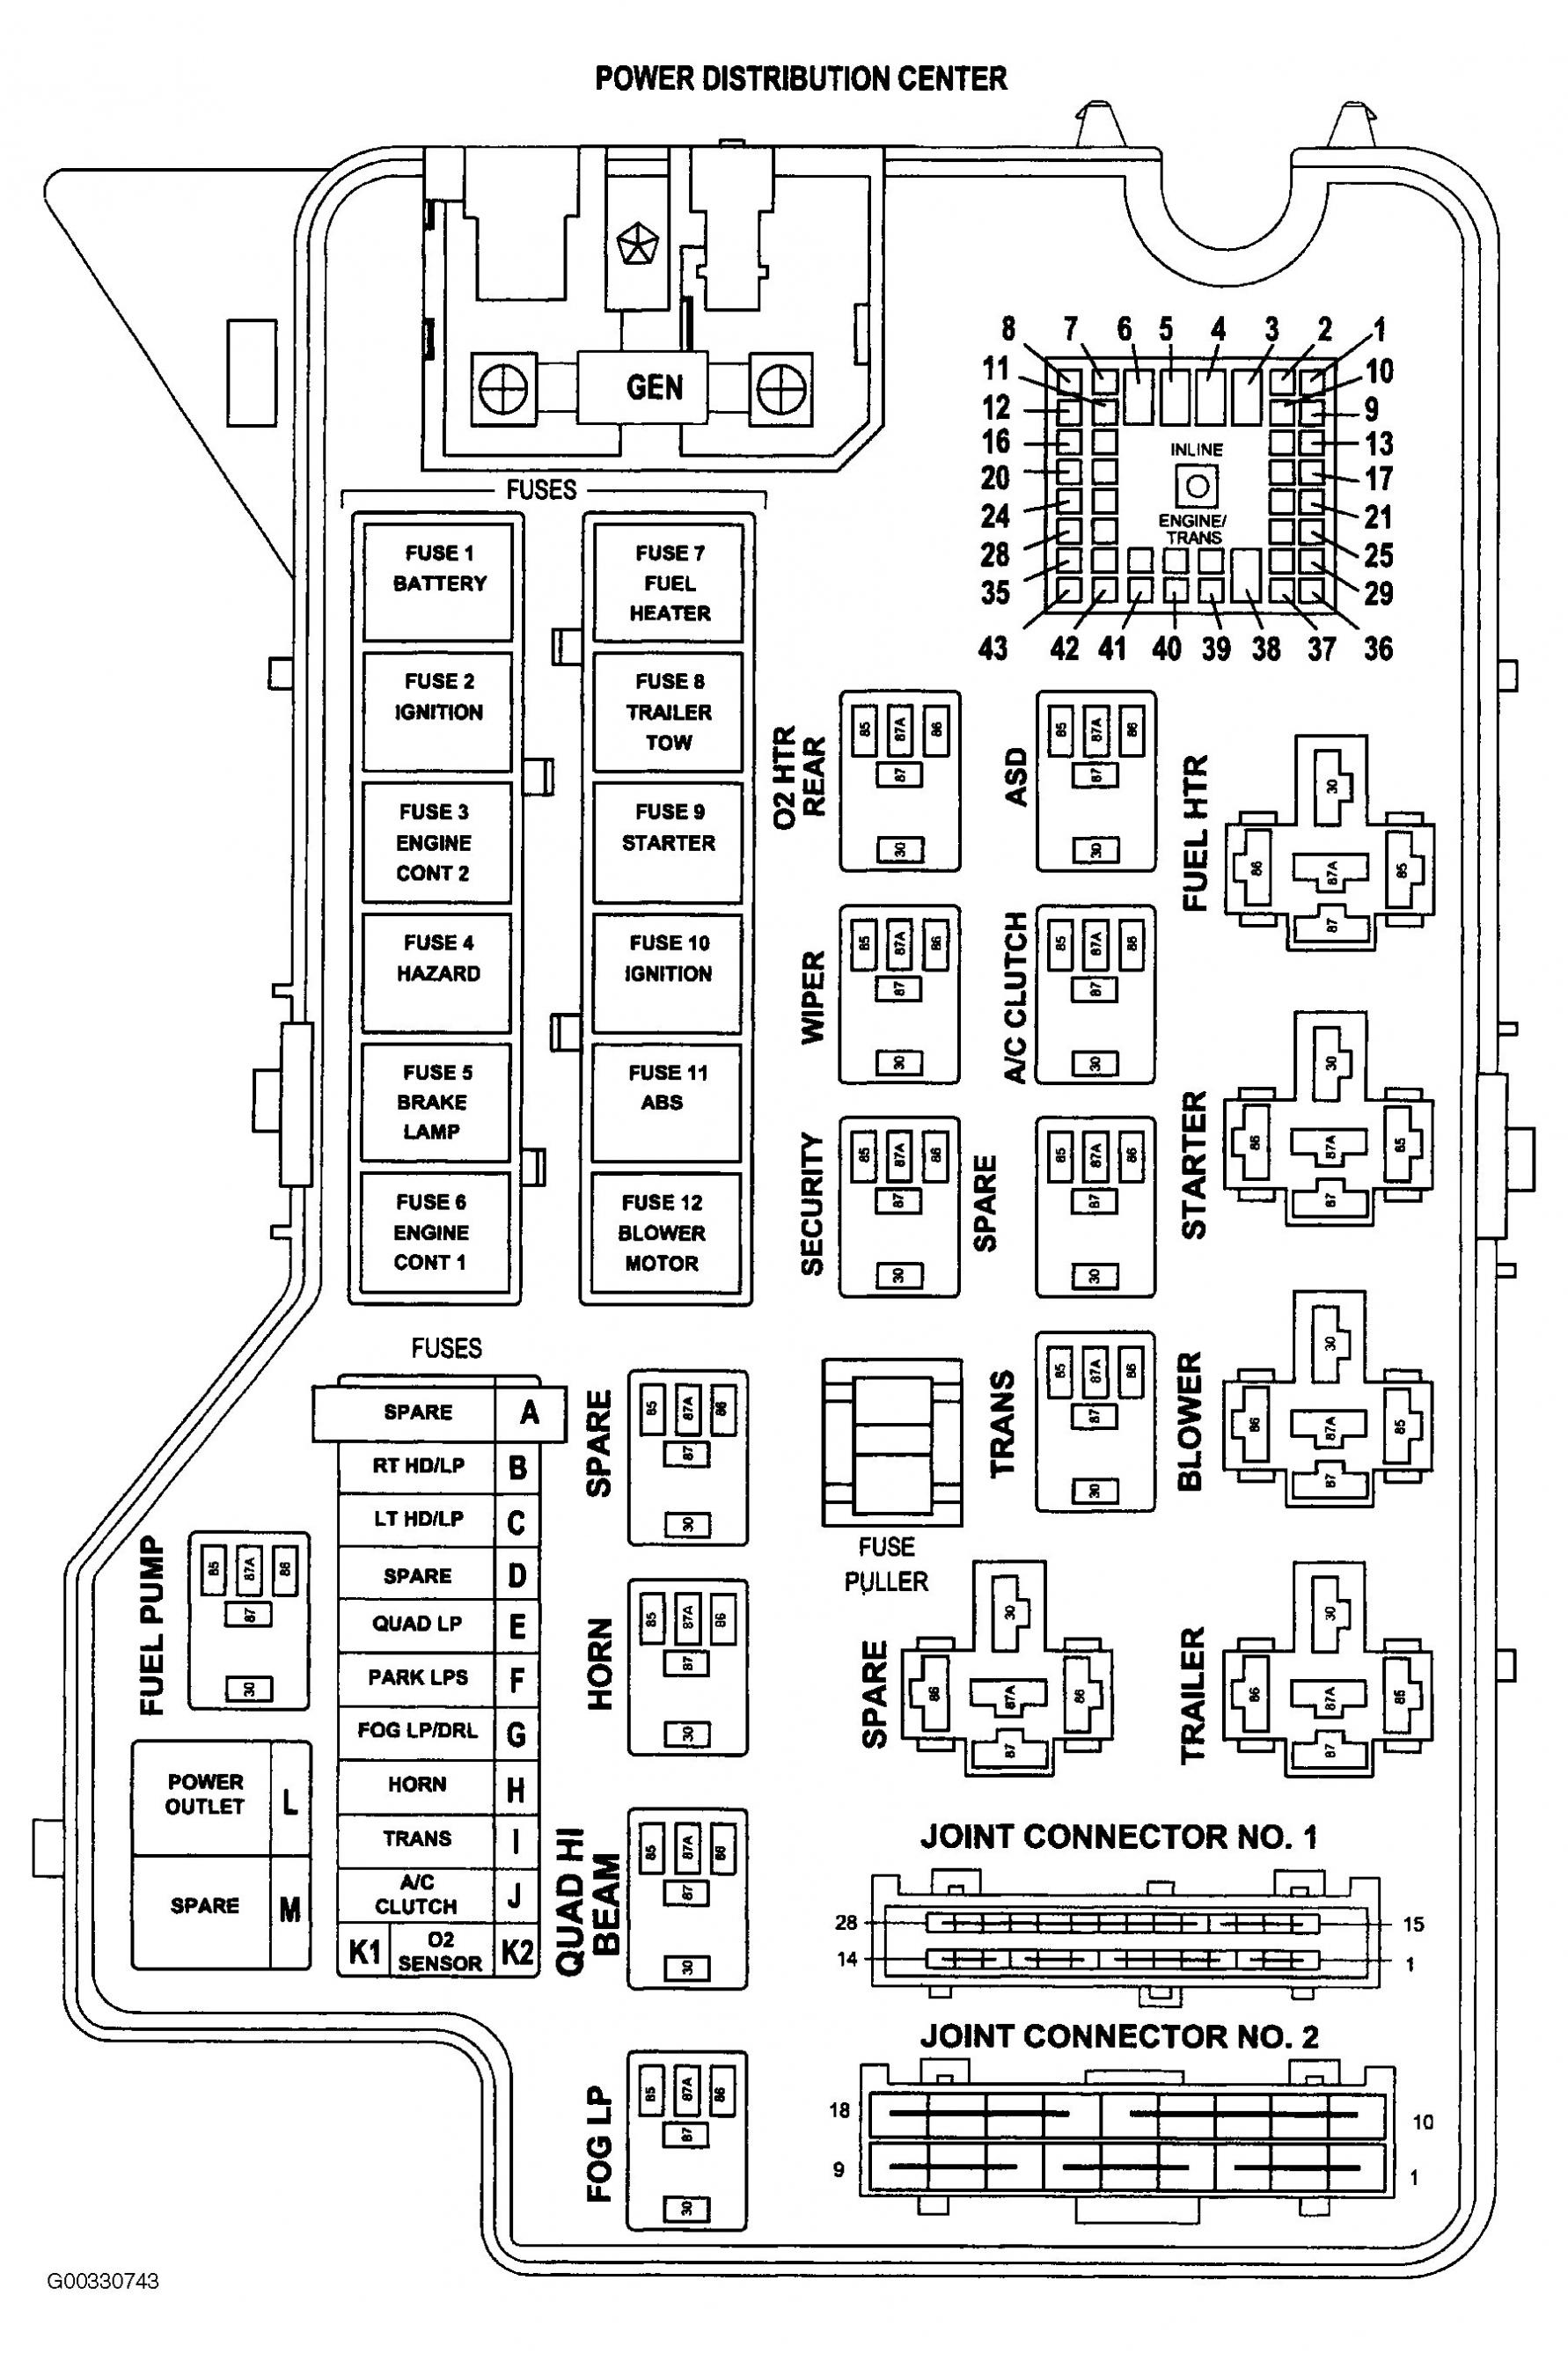 2007 Dodge Caliber Headlight Wiring Diagram | Wiring Library - 2007 Dodge Caliber Headlight Wiring Diagram